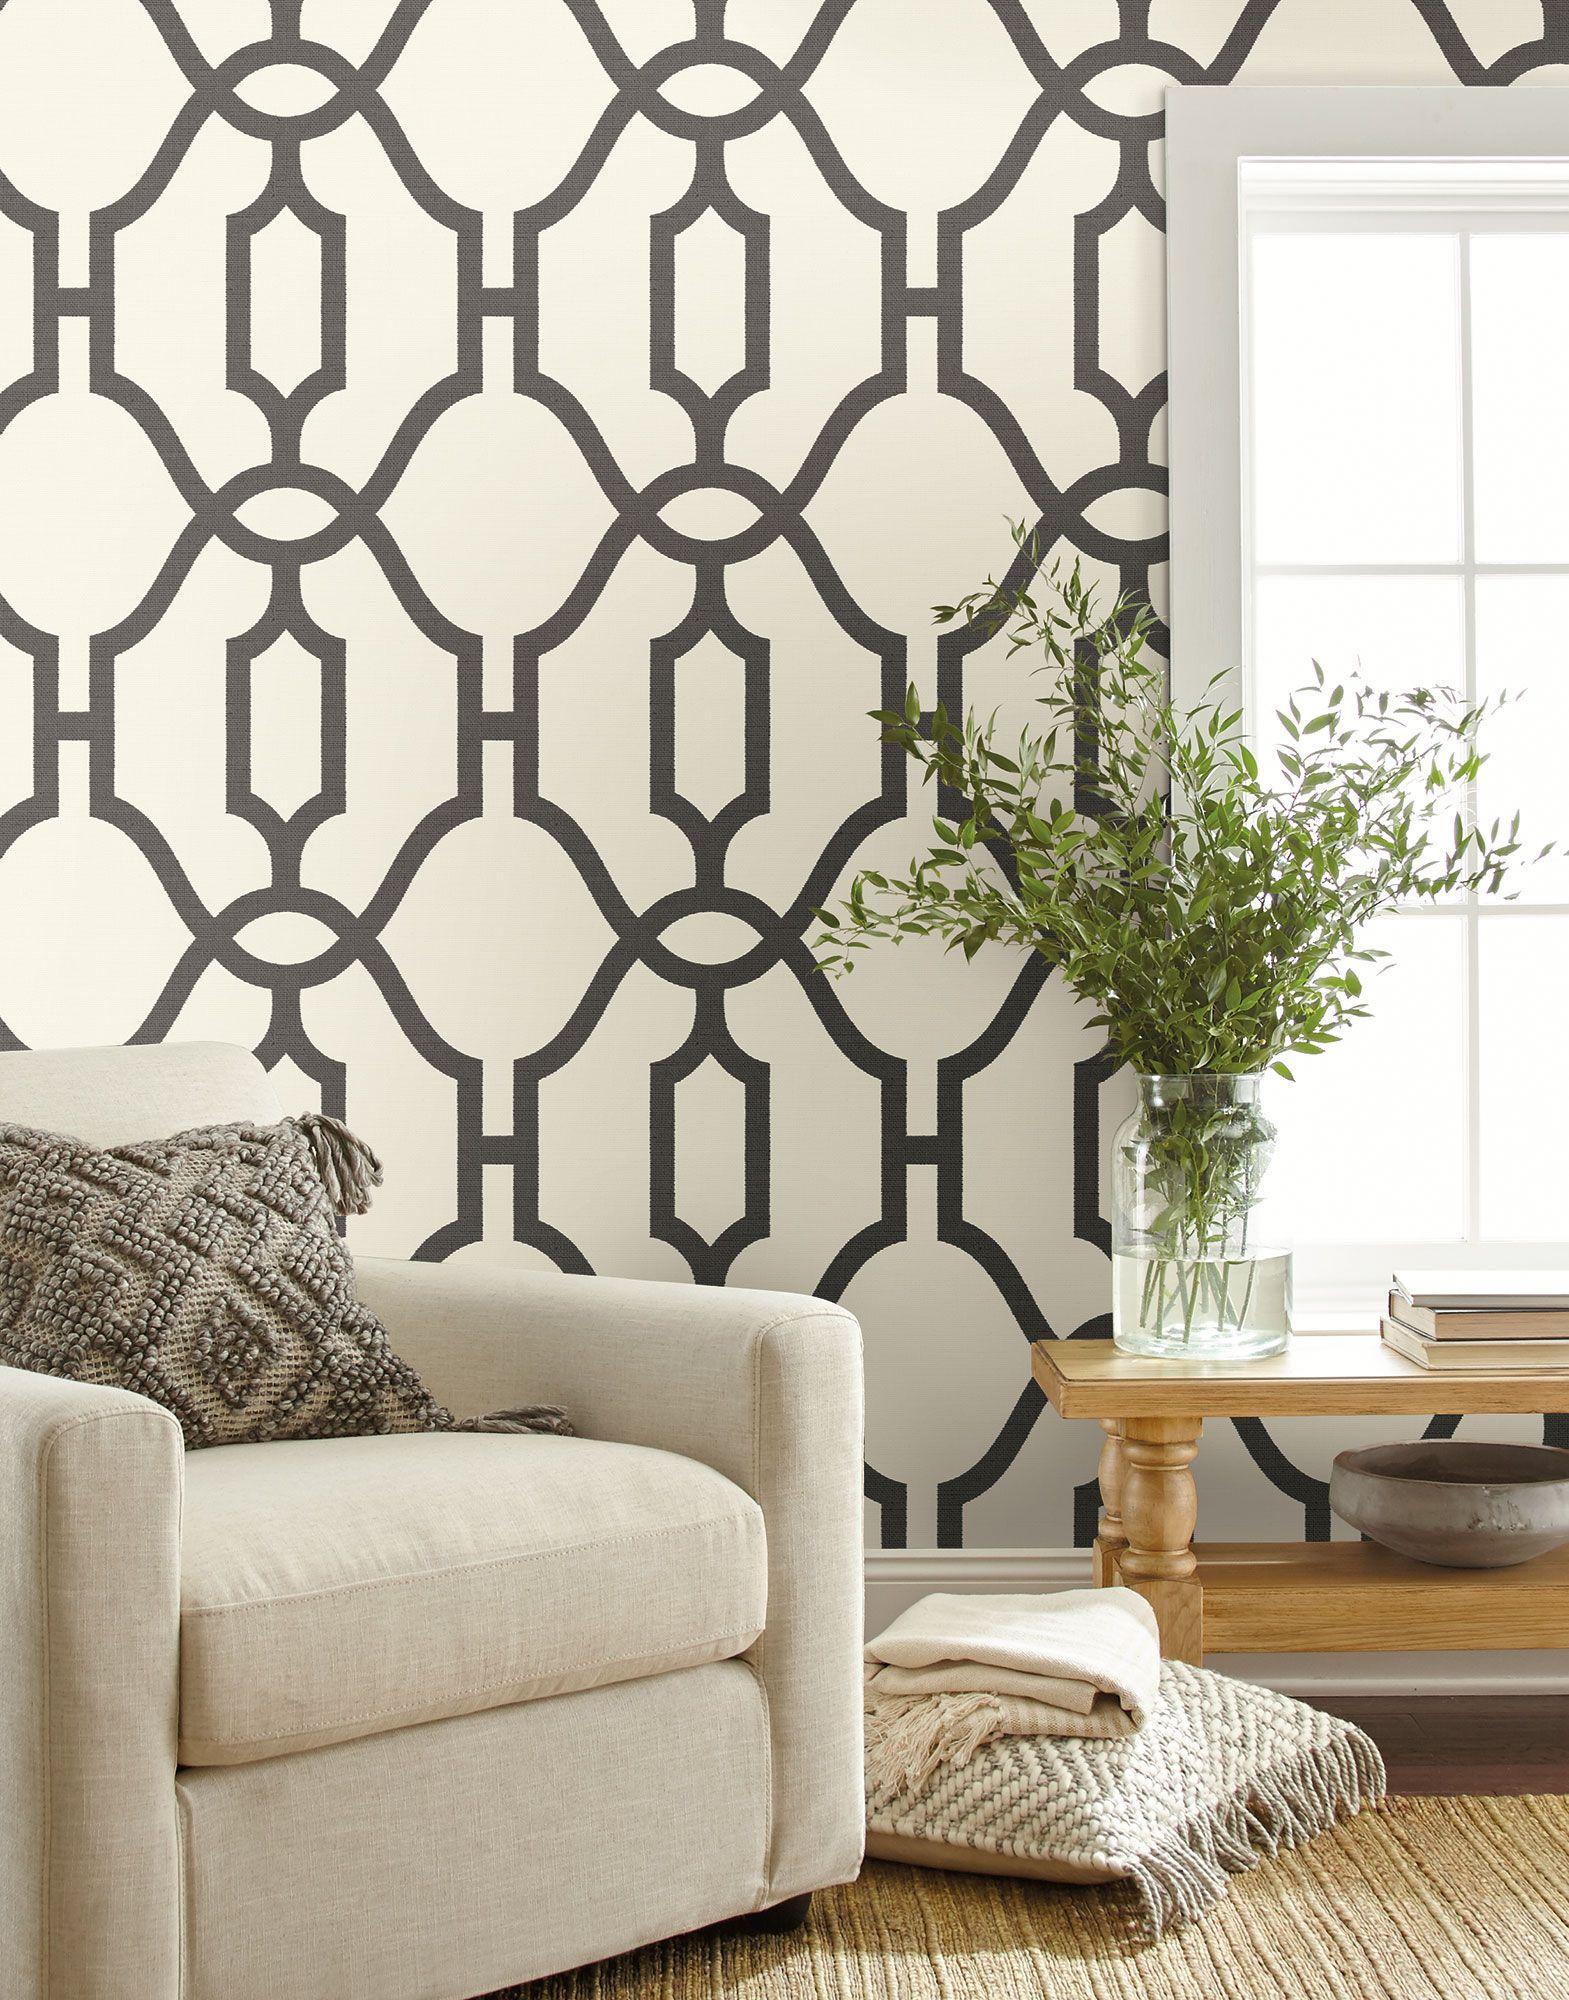 Magnolia Home Woven Trellis Wallpaper Charcoal & Cream